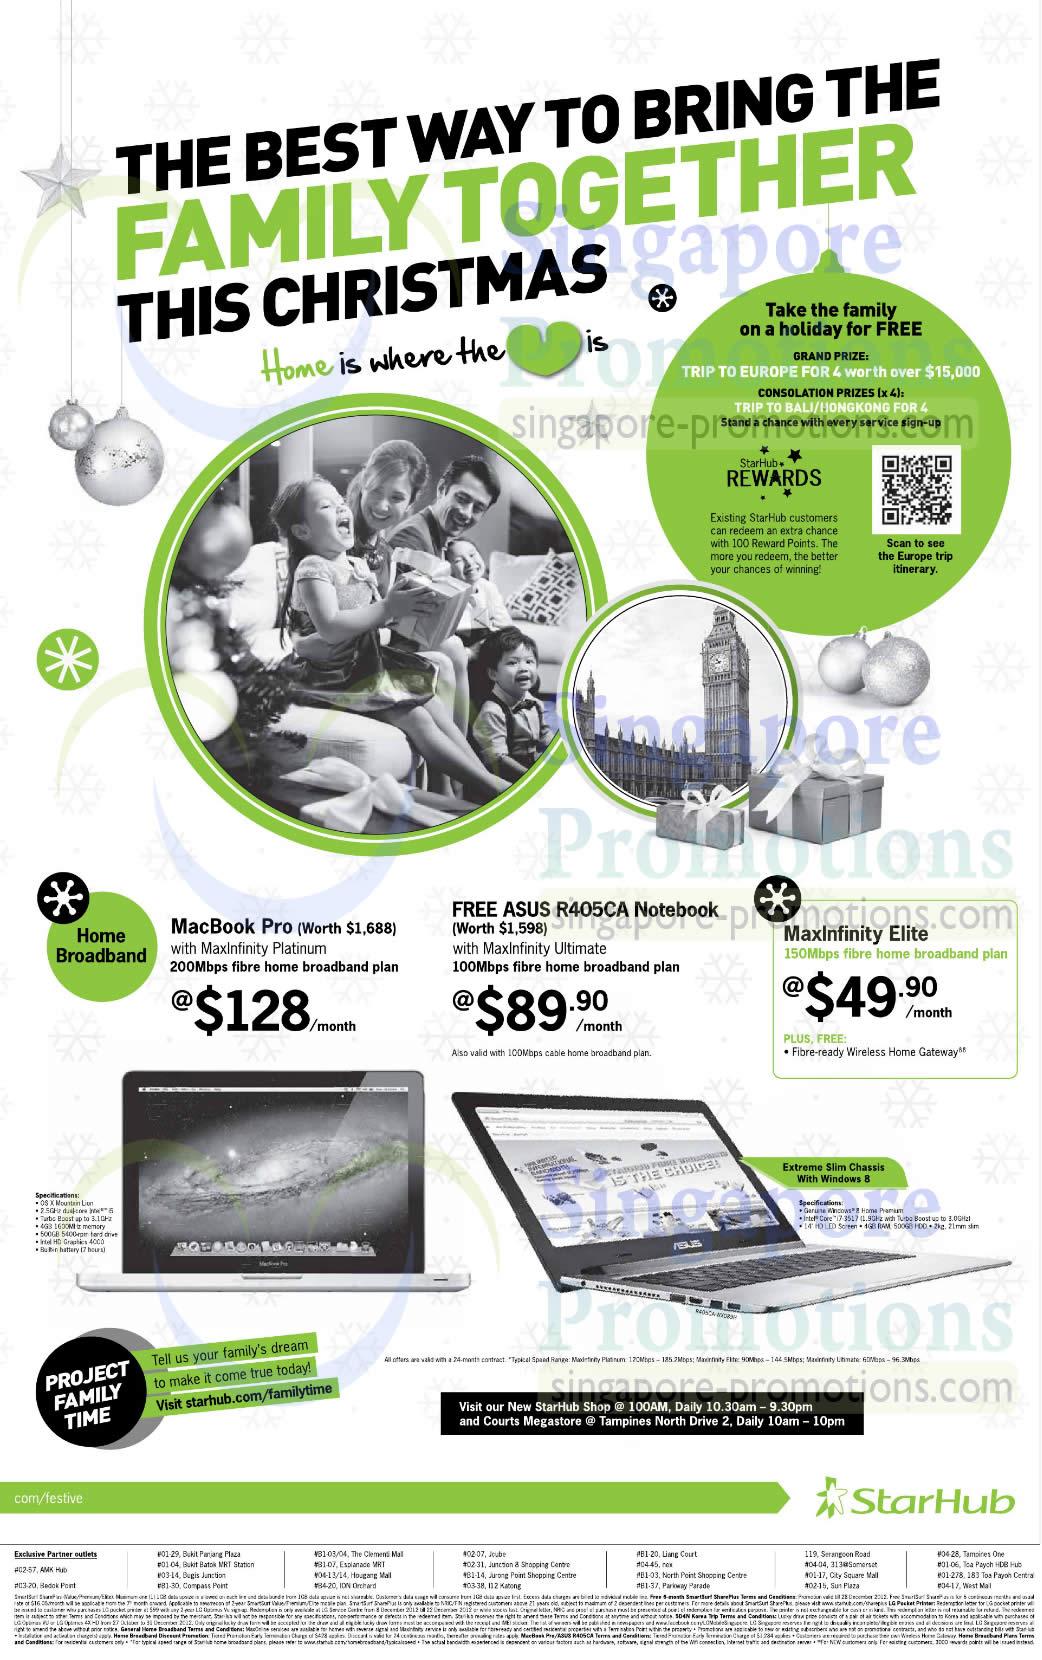 Broadband Free Macbook Pro, Free ASUS R405CA Notebook, MaxInfinity Elite 150Mbps Fibre Home Broadband